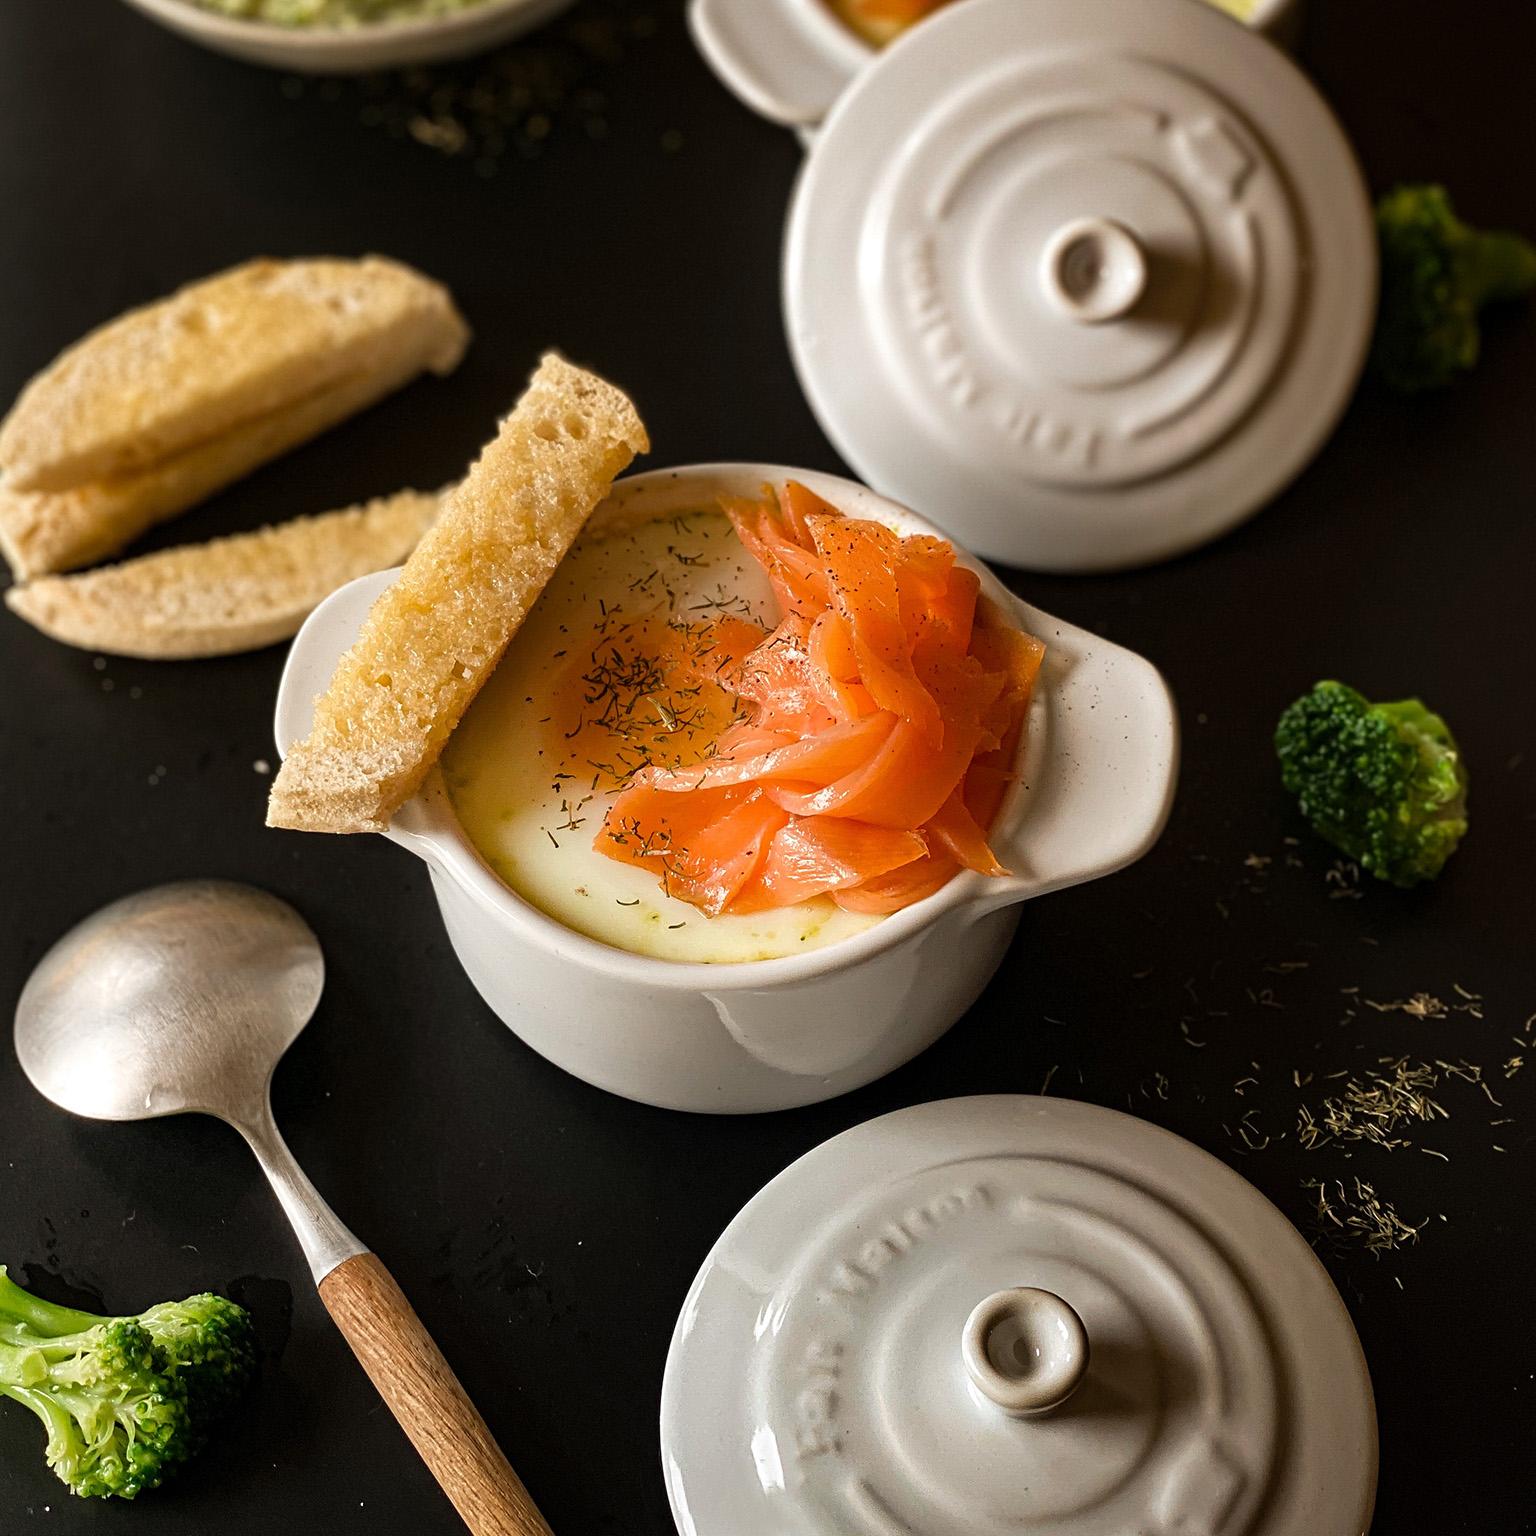 Oeuf_cocotte_saumon_brocoli